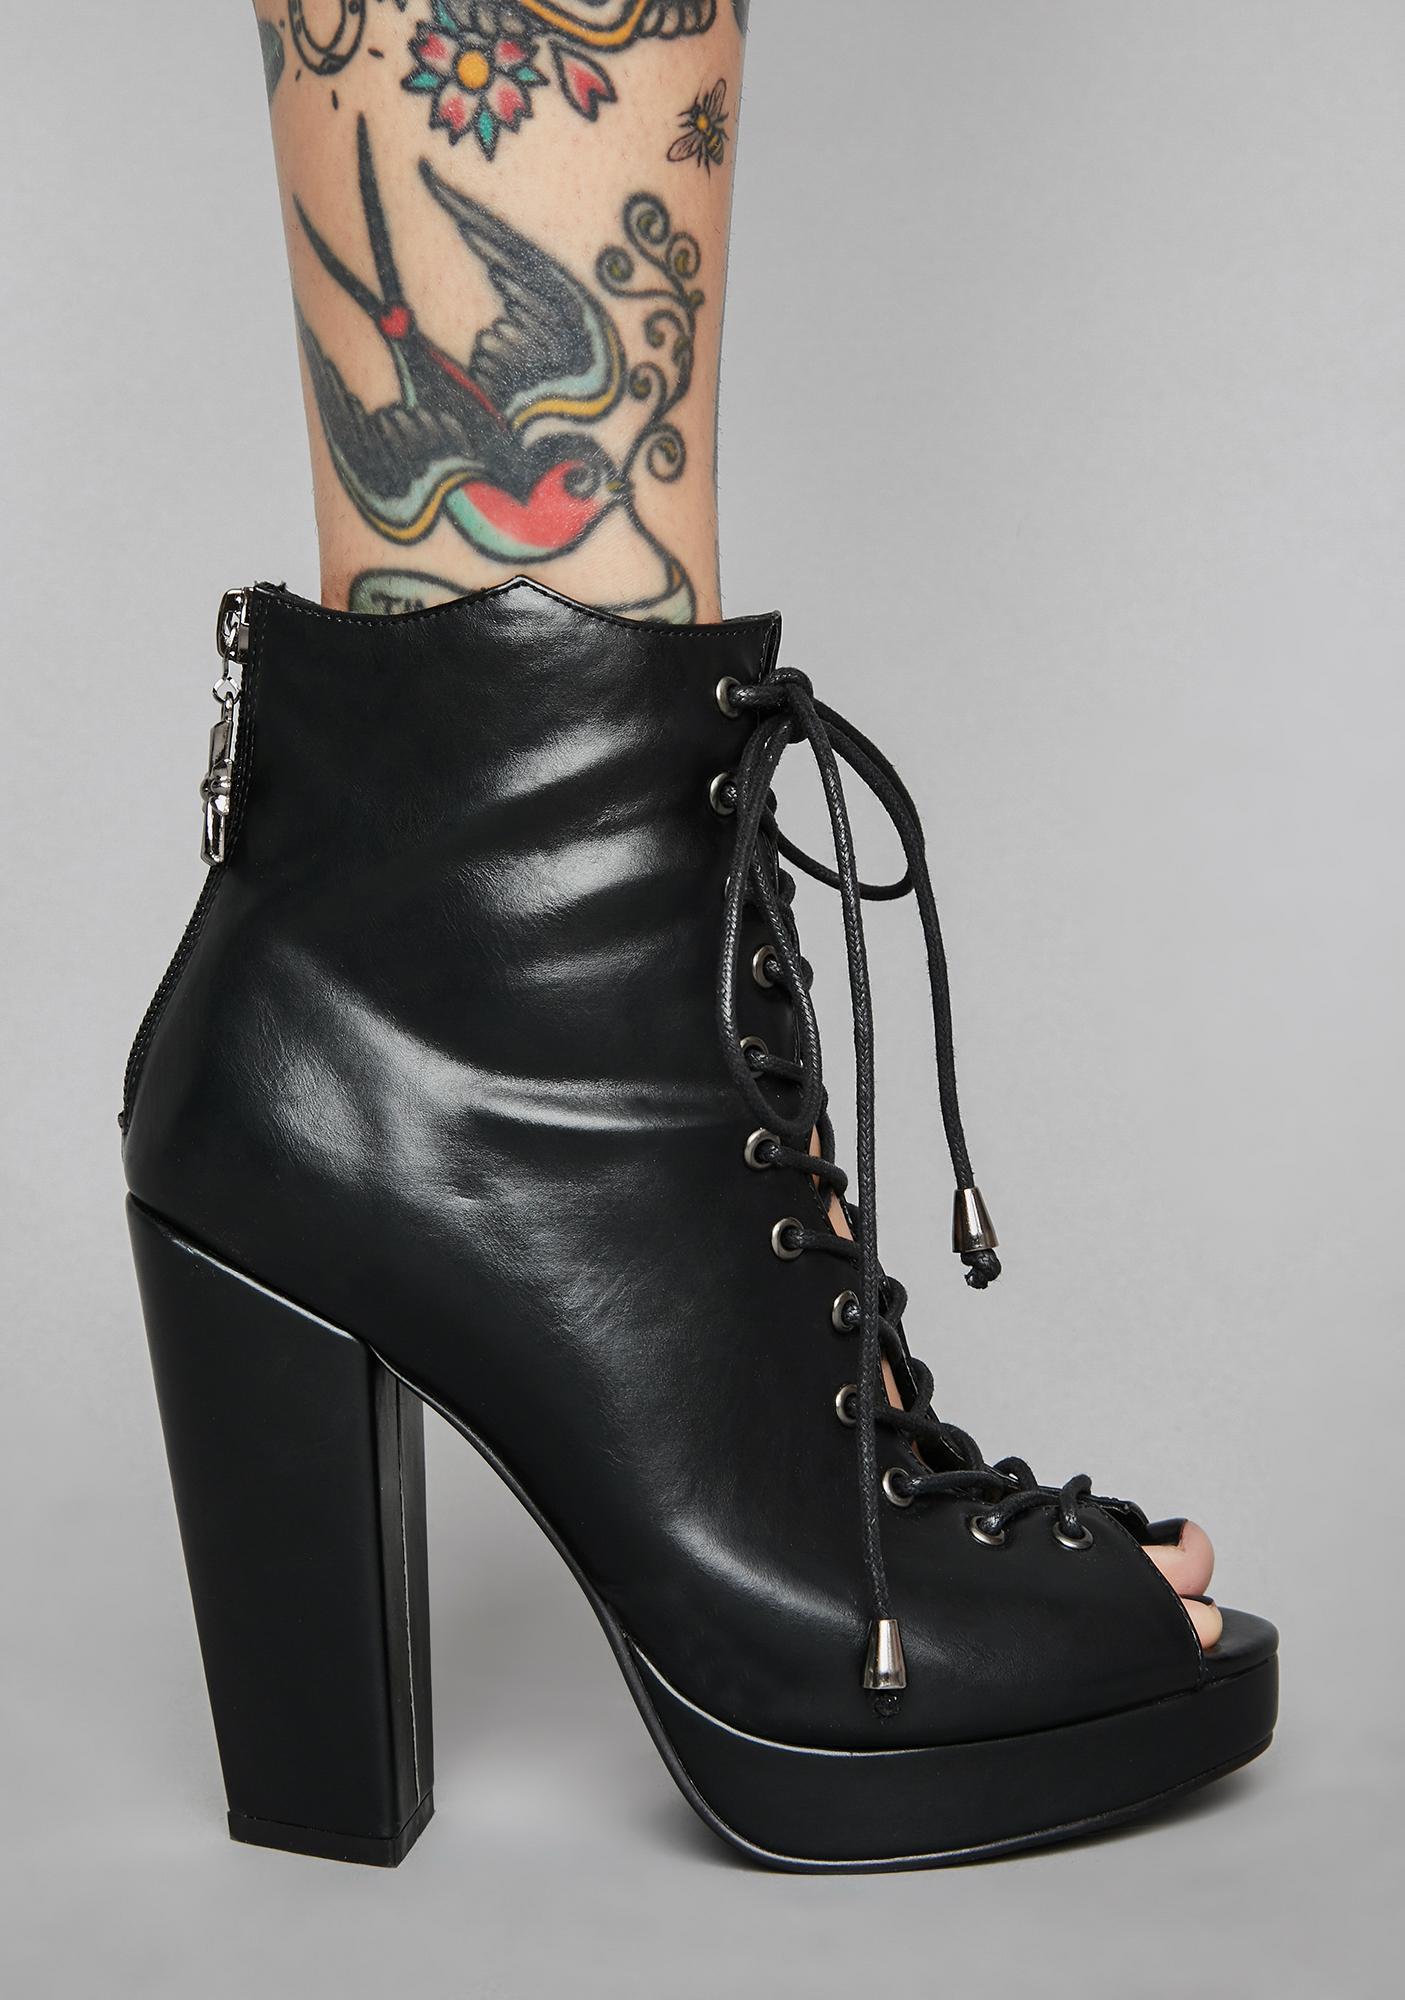 Widow Spirit Crusher Peep Toe Heels